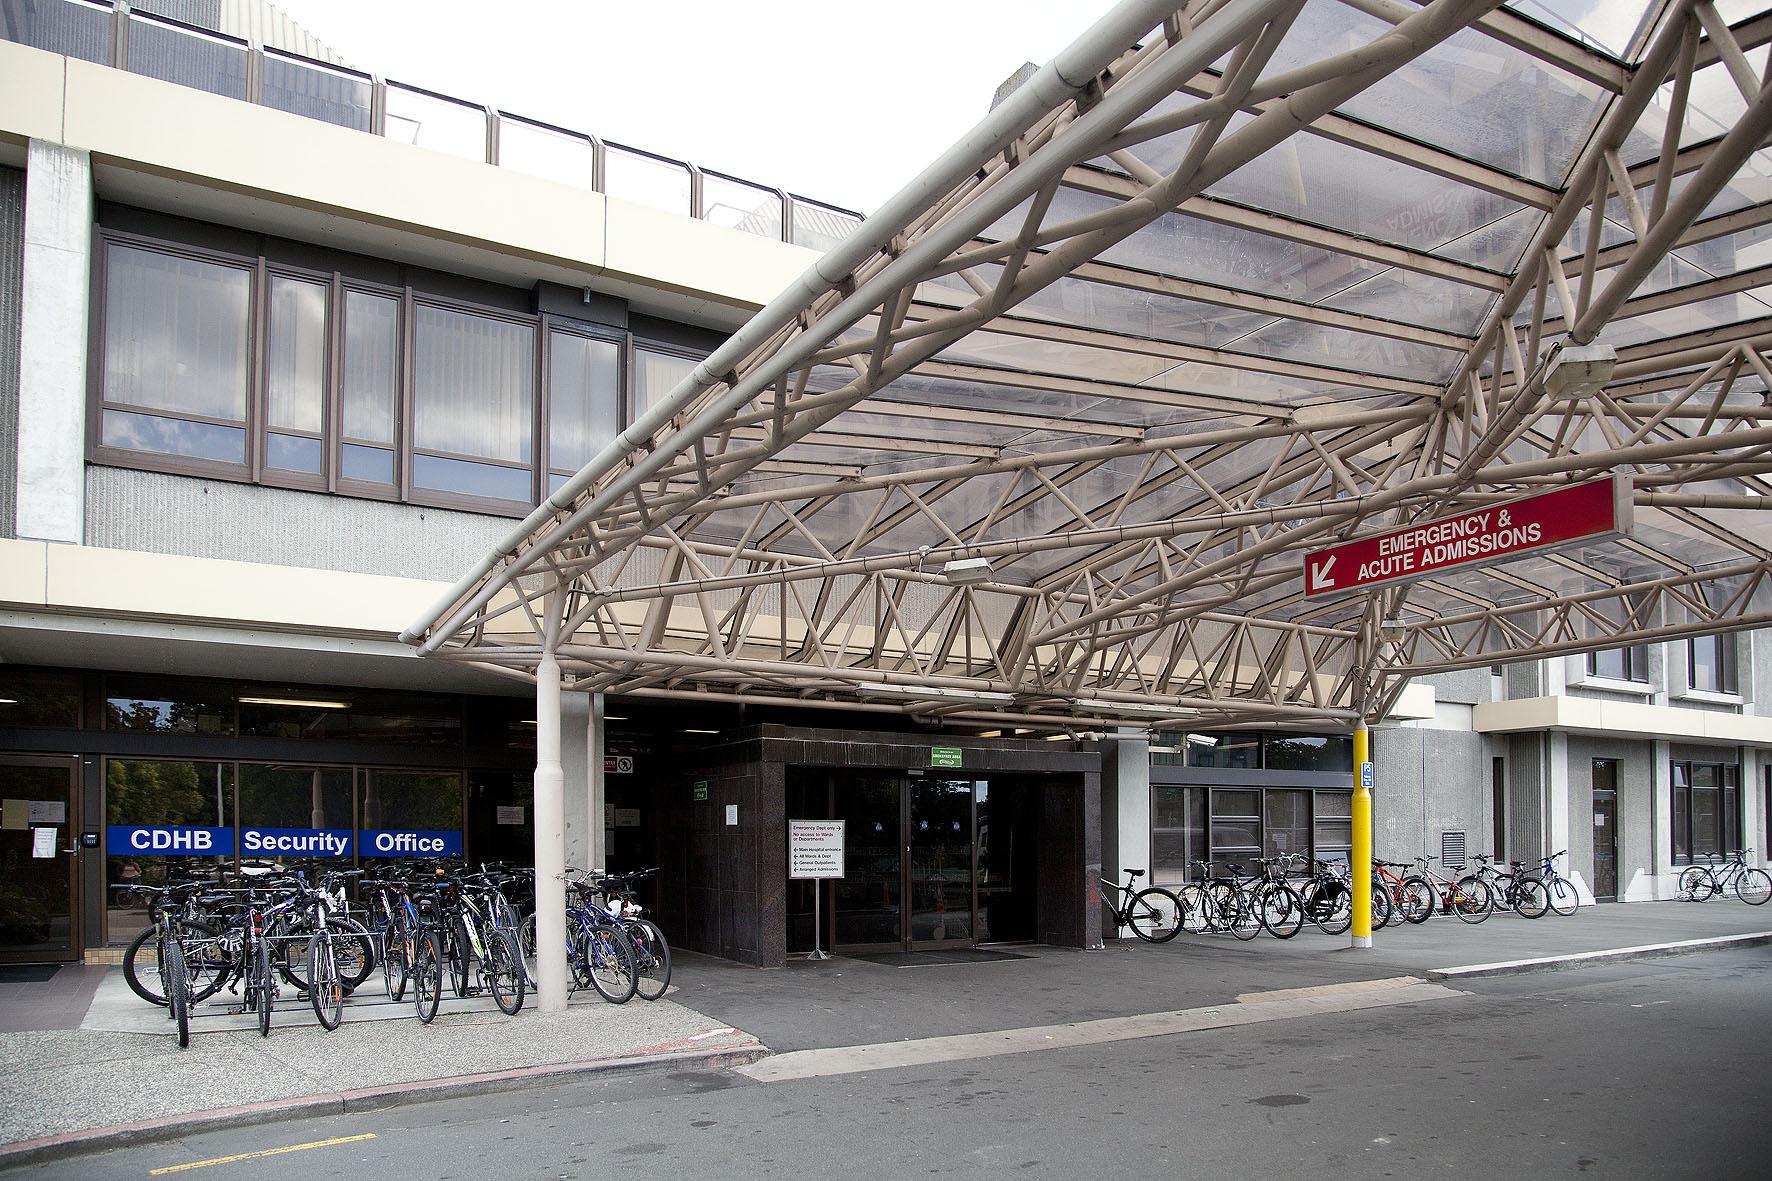 Christchurch Hospital Emergency Department. Photo: Geoff Sloan